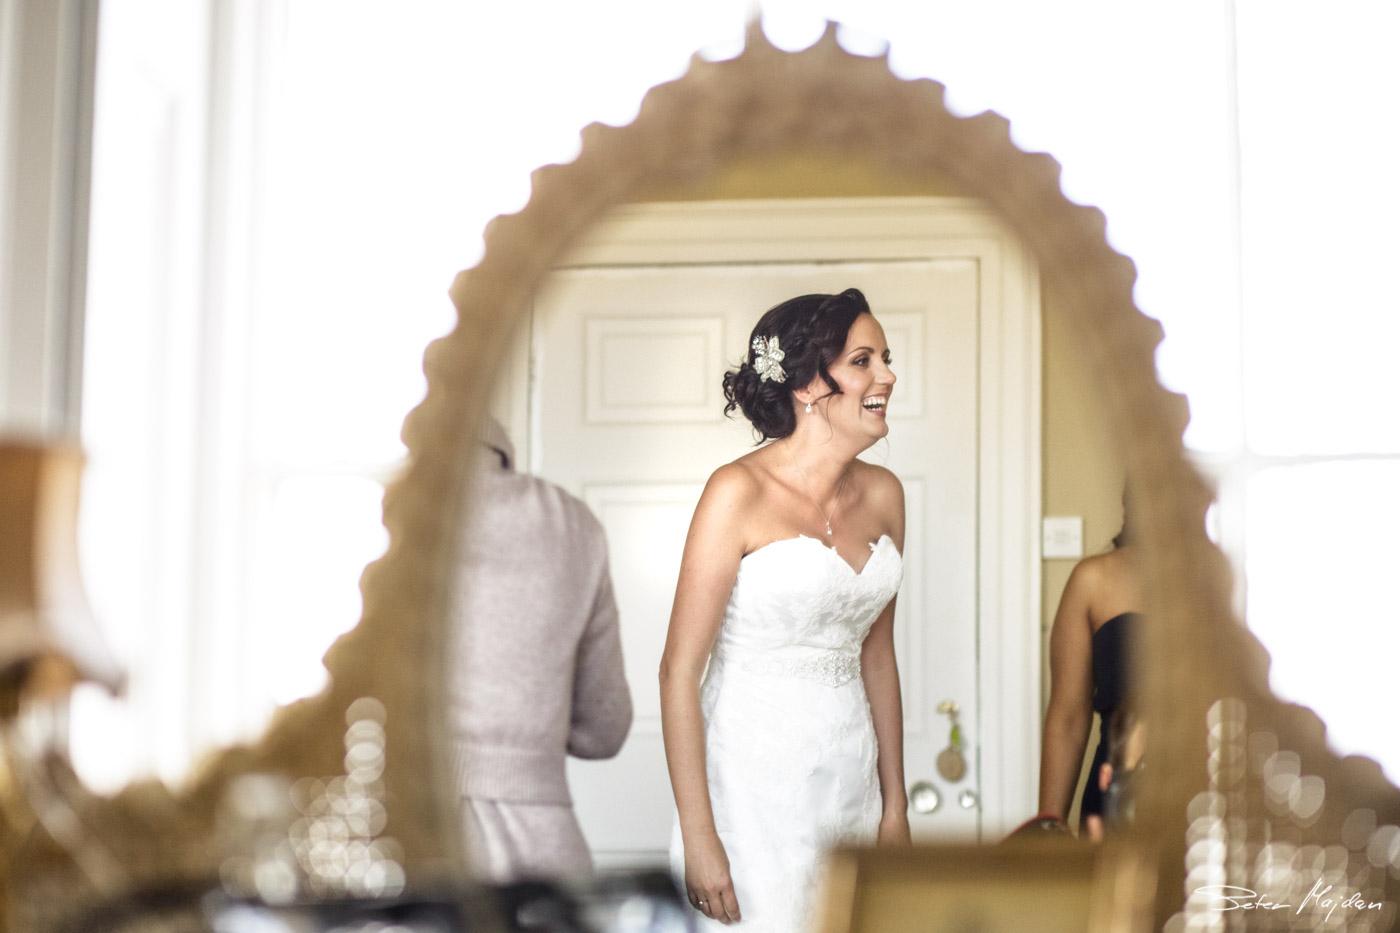 east-bridgford-hill-wedding-photography-18.jpg